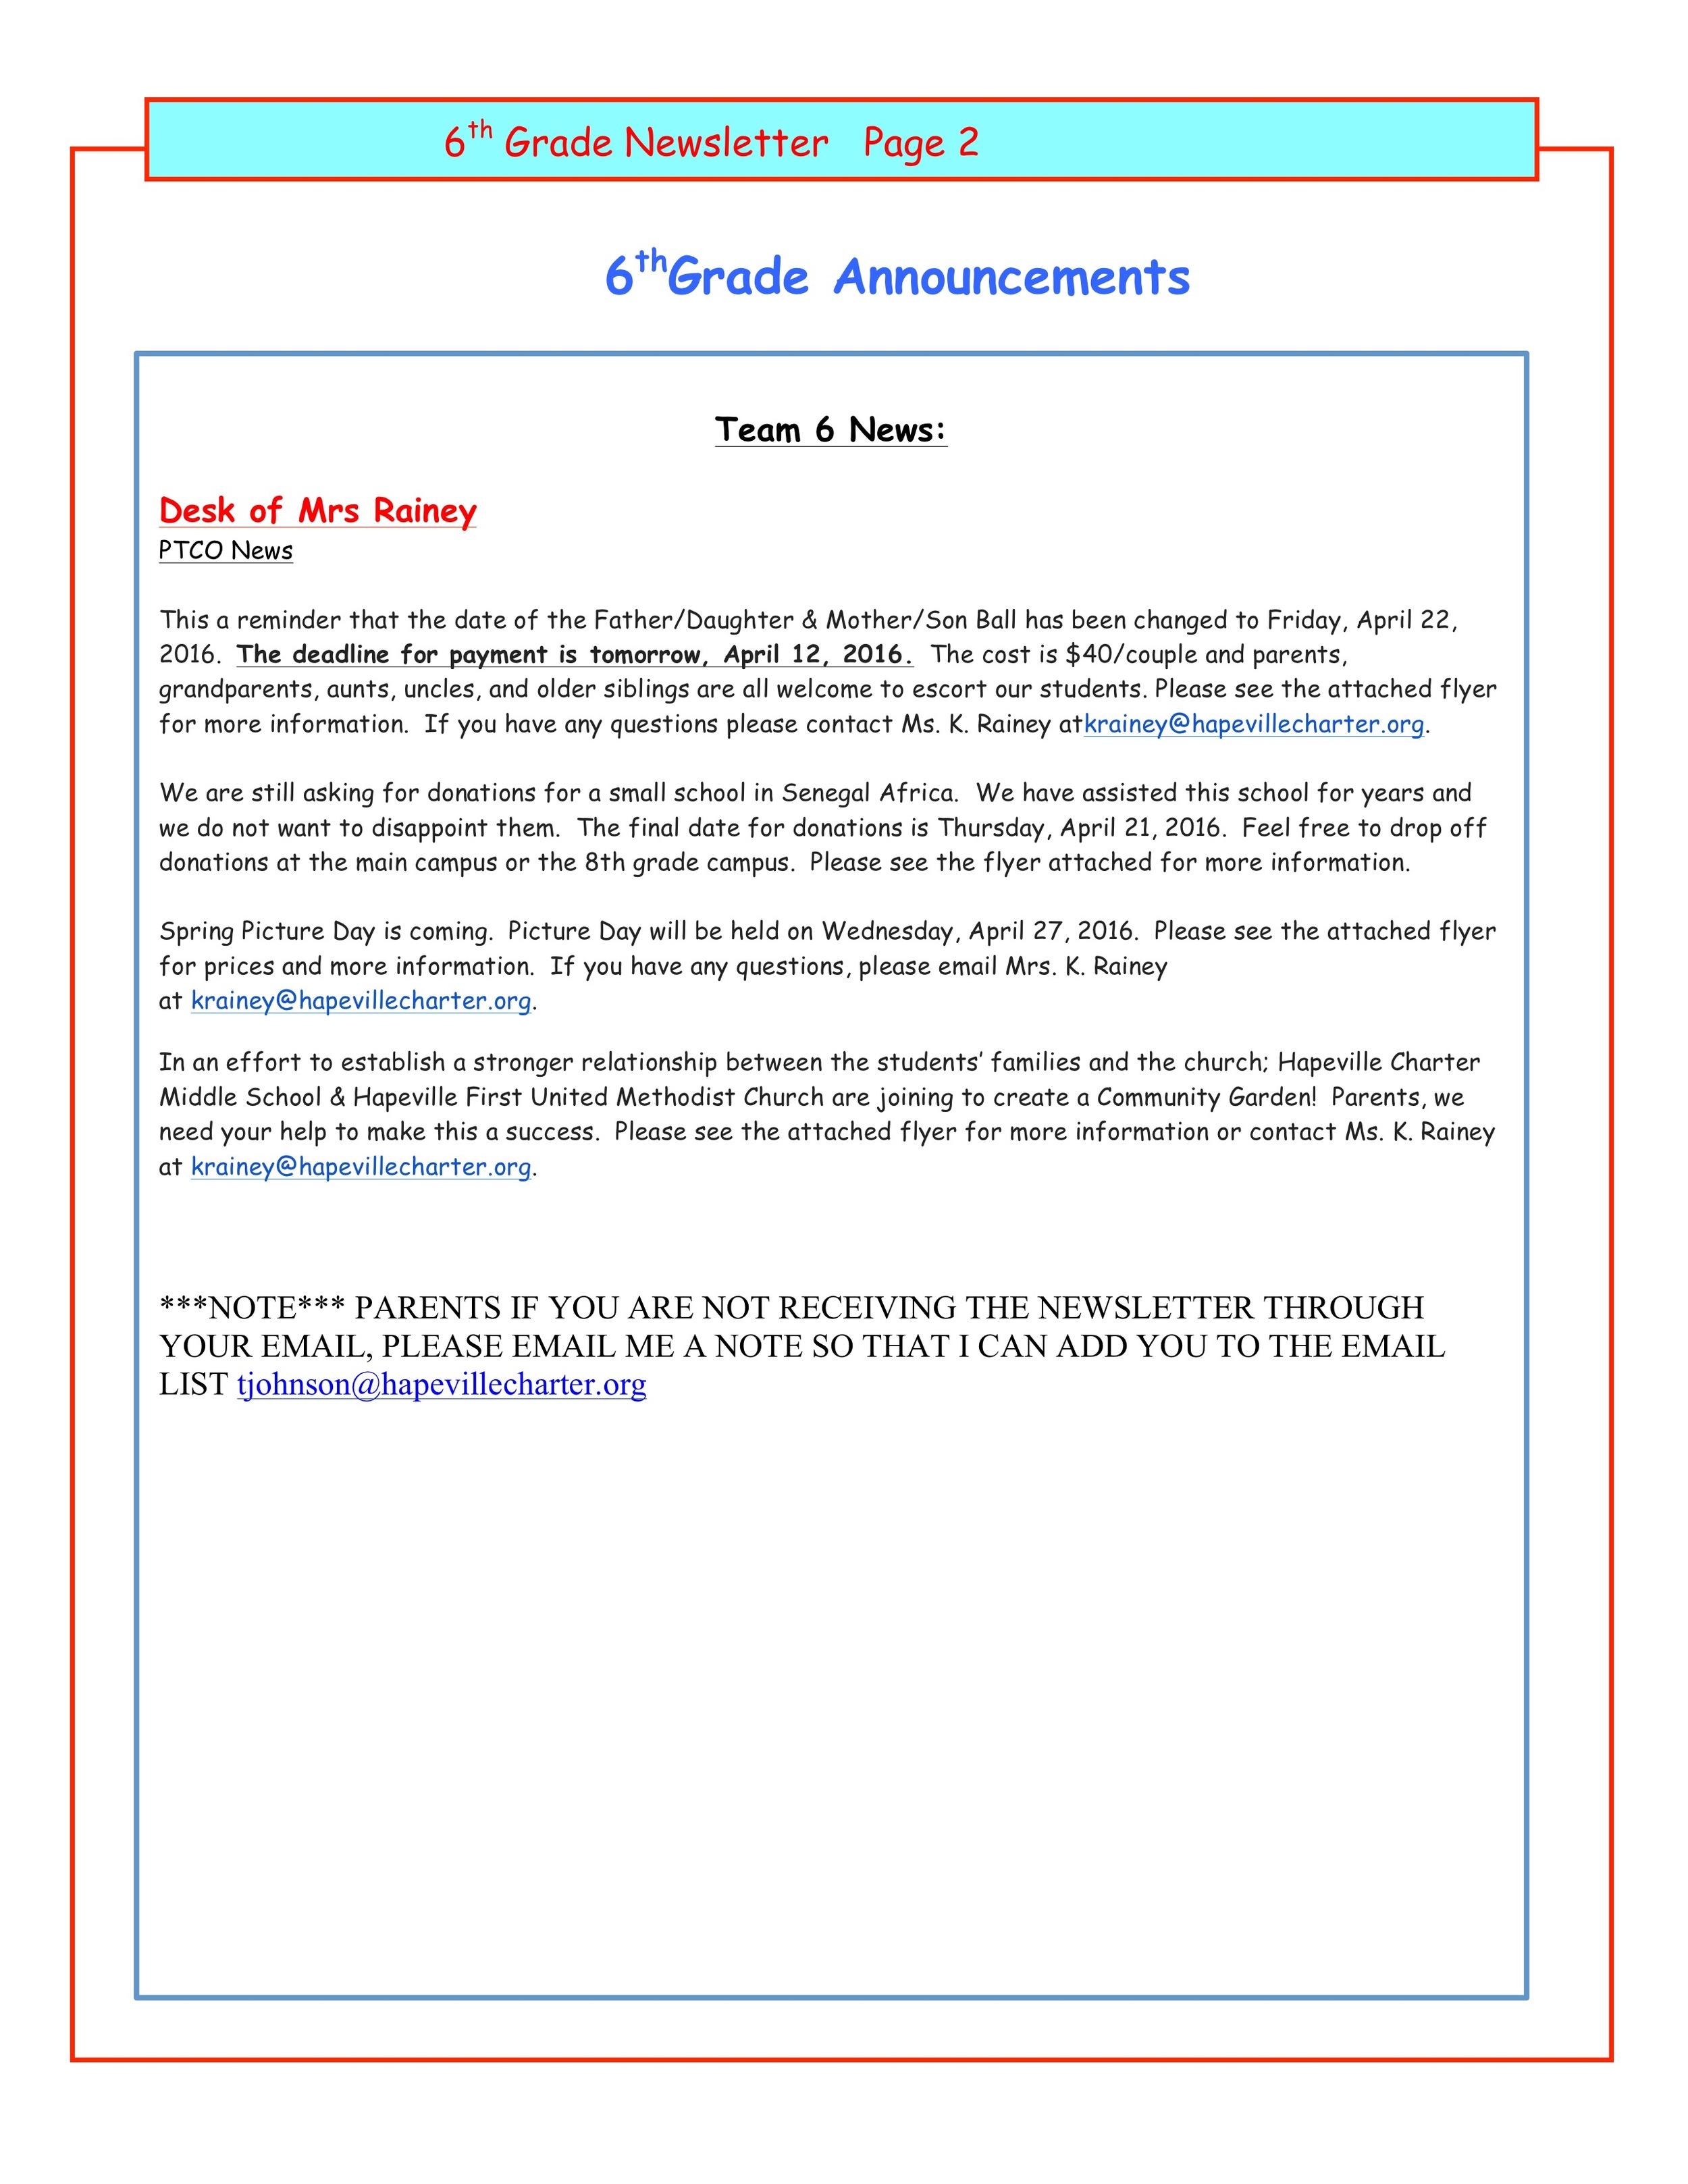 Newsletter Image6th Grade 4-11-2016 2.jpeg